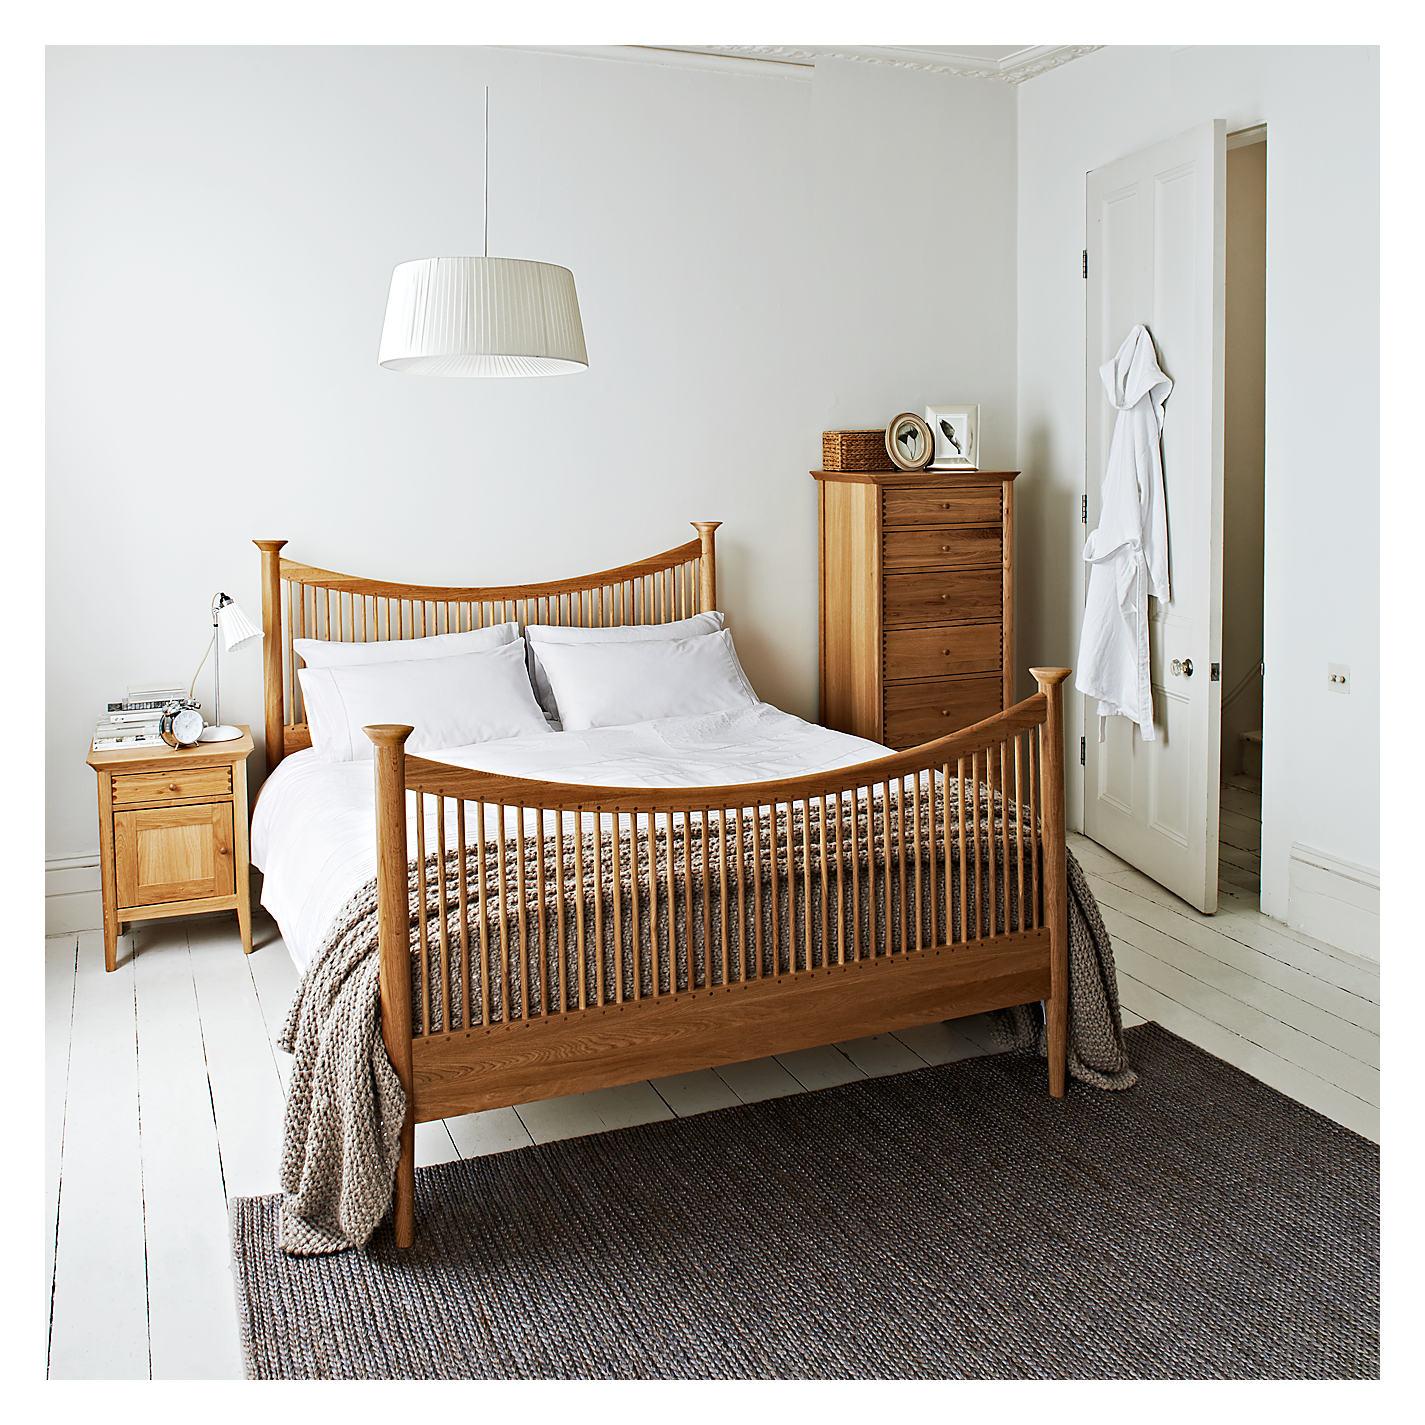 John lewis childrens bedroom furniture - John Lewis Childrens Bedroom Furniture Memsaheb Net